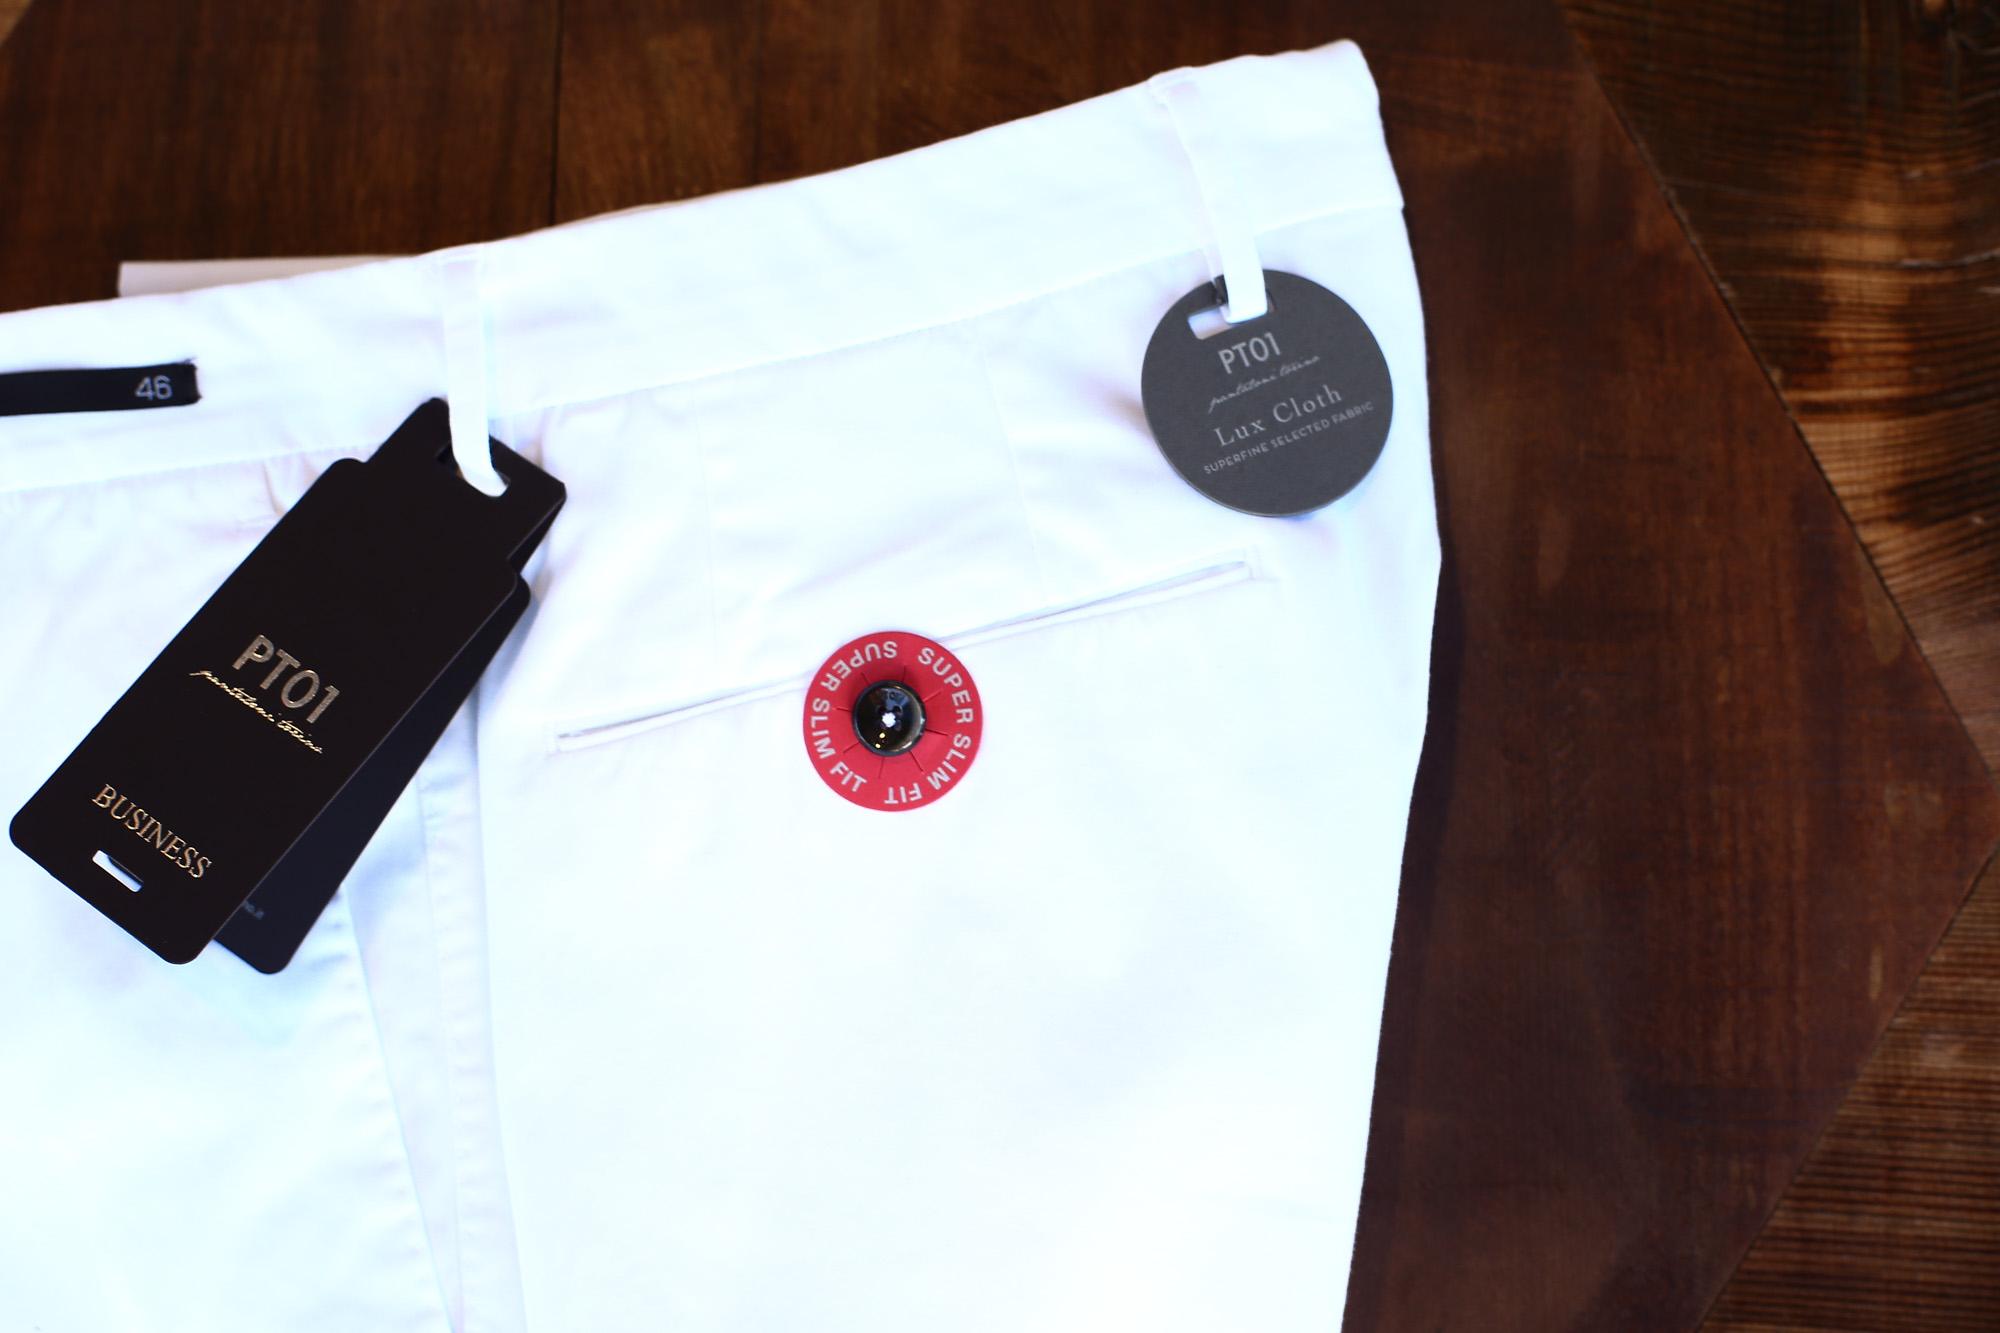 PT01 (ピーティーゼロウーノ) BUSINESS (ビジネス) SUPER SLIM FIT (スーパースリムフィット) Lux Cloth ストレッチ コットン スラックス パンツ WHITE (ホワイト・0010) 2018 春夏新作 pt01 チノ チノパン チノスラックス 愛知 名古屋 ZODIAC ゾディアック